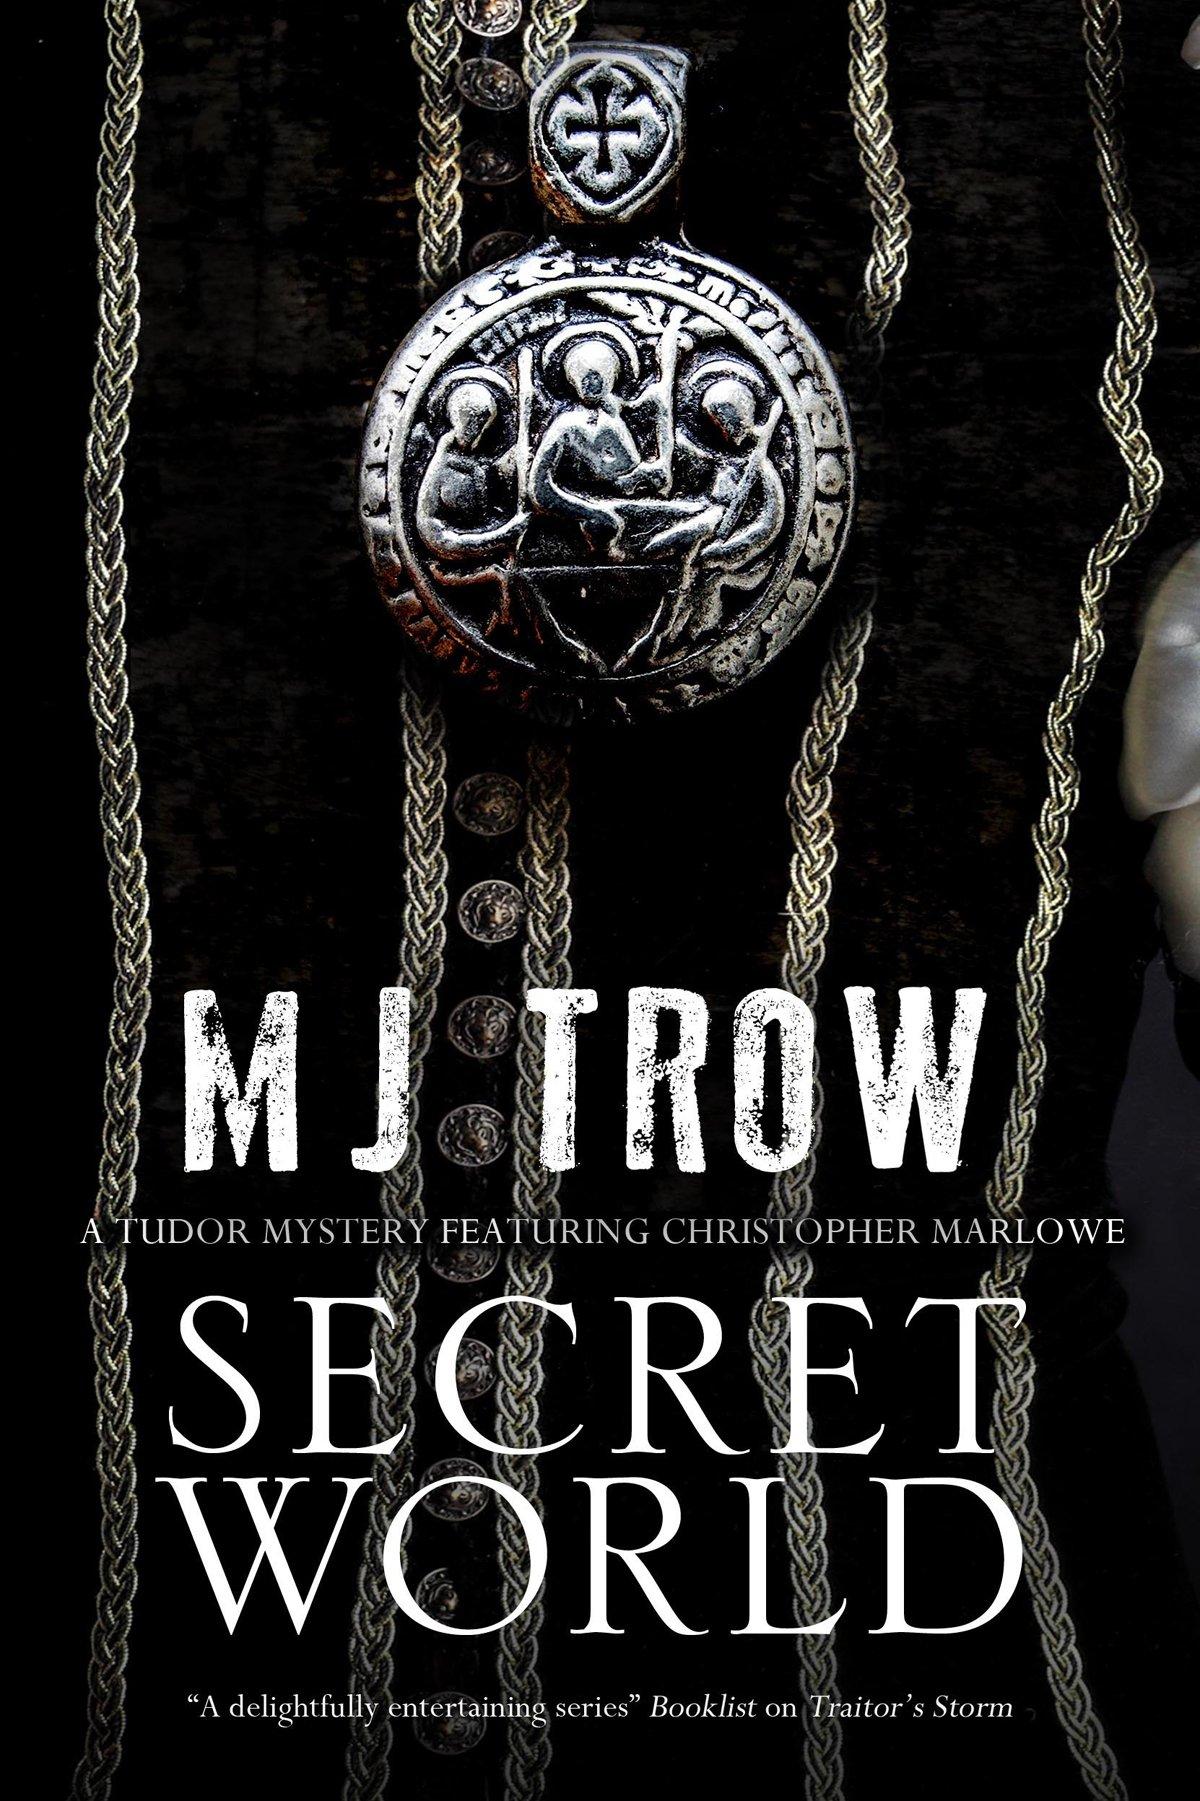 Download Secret World: A Tudor mystery featuring Christopher Marlowe (A Kit Marlowe Mystery) pdf epub